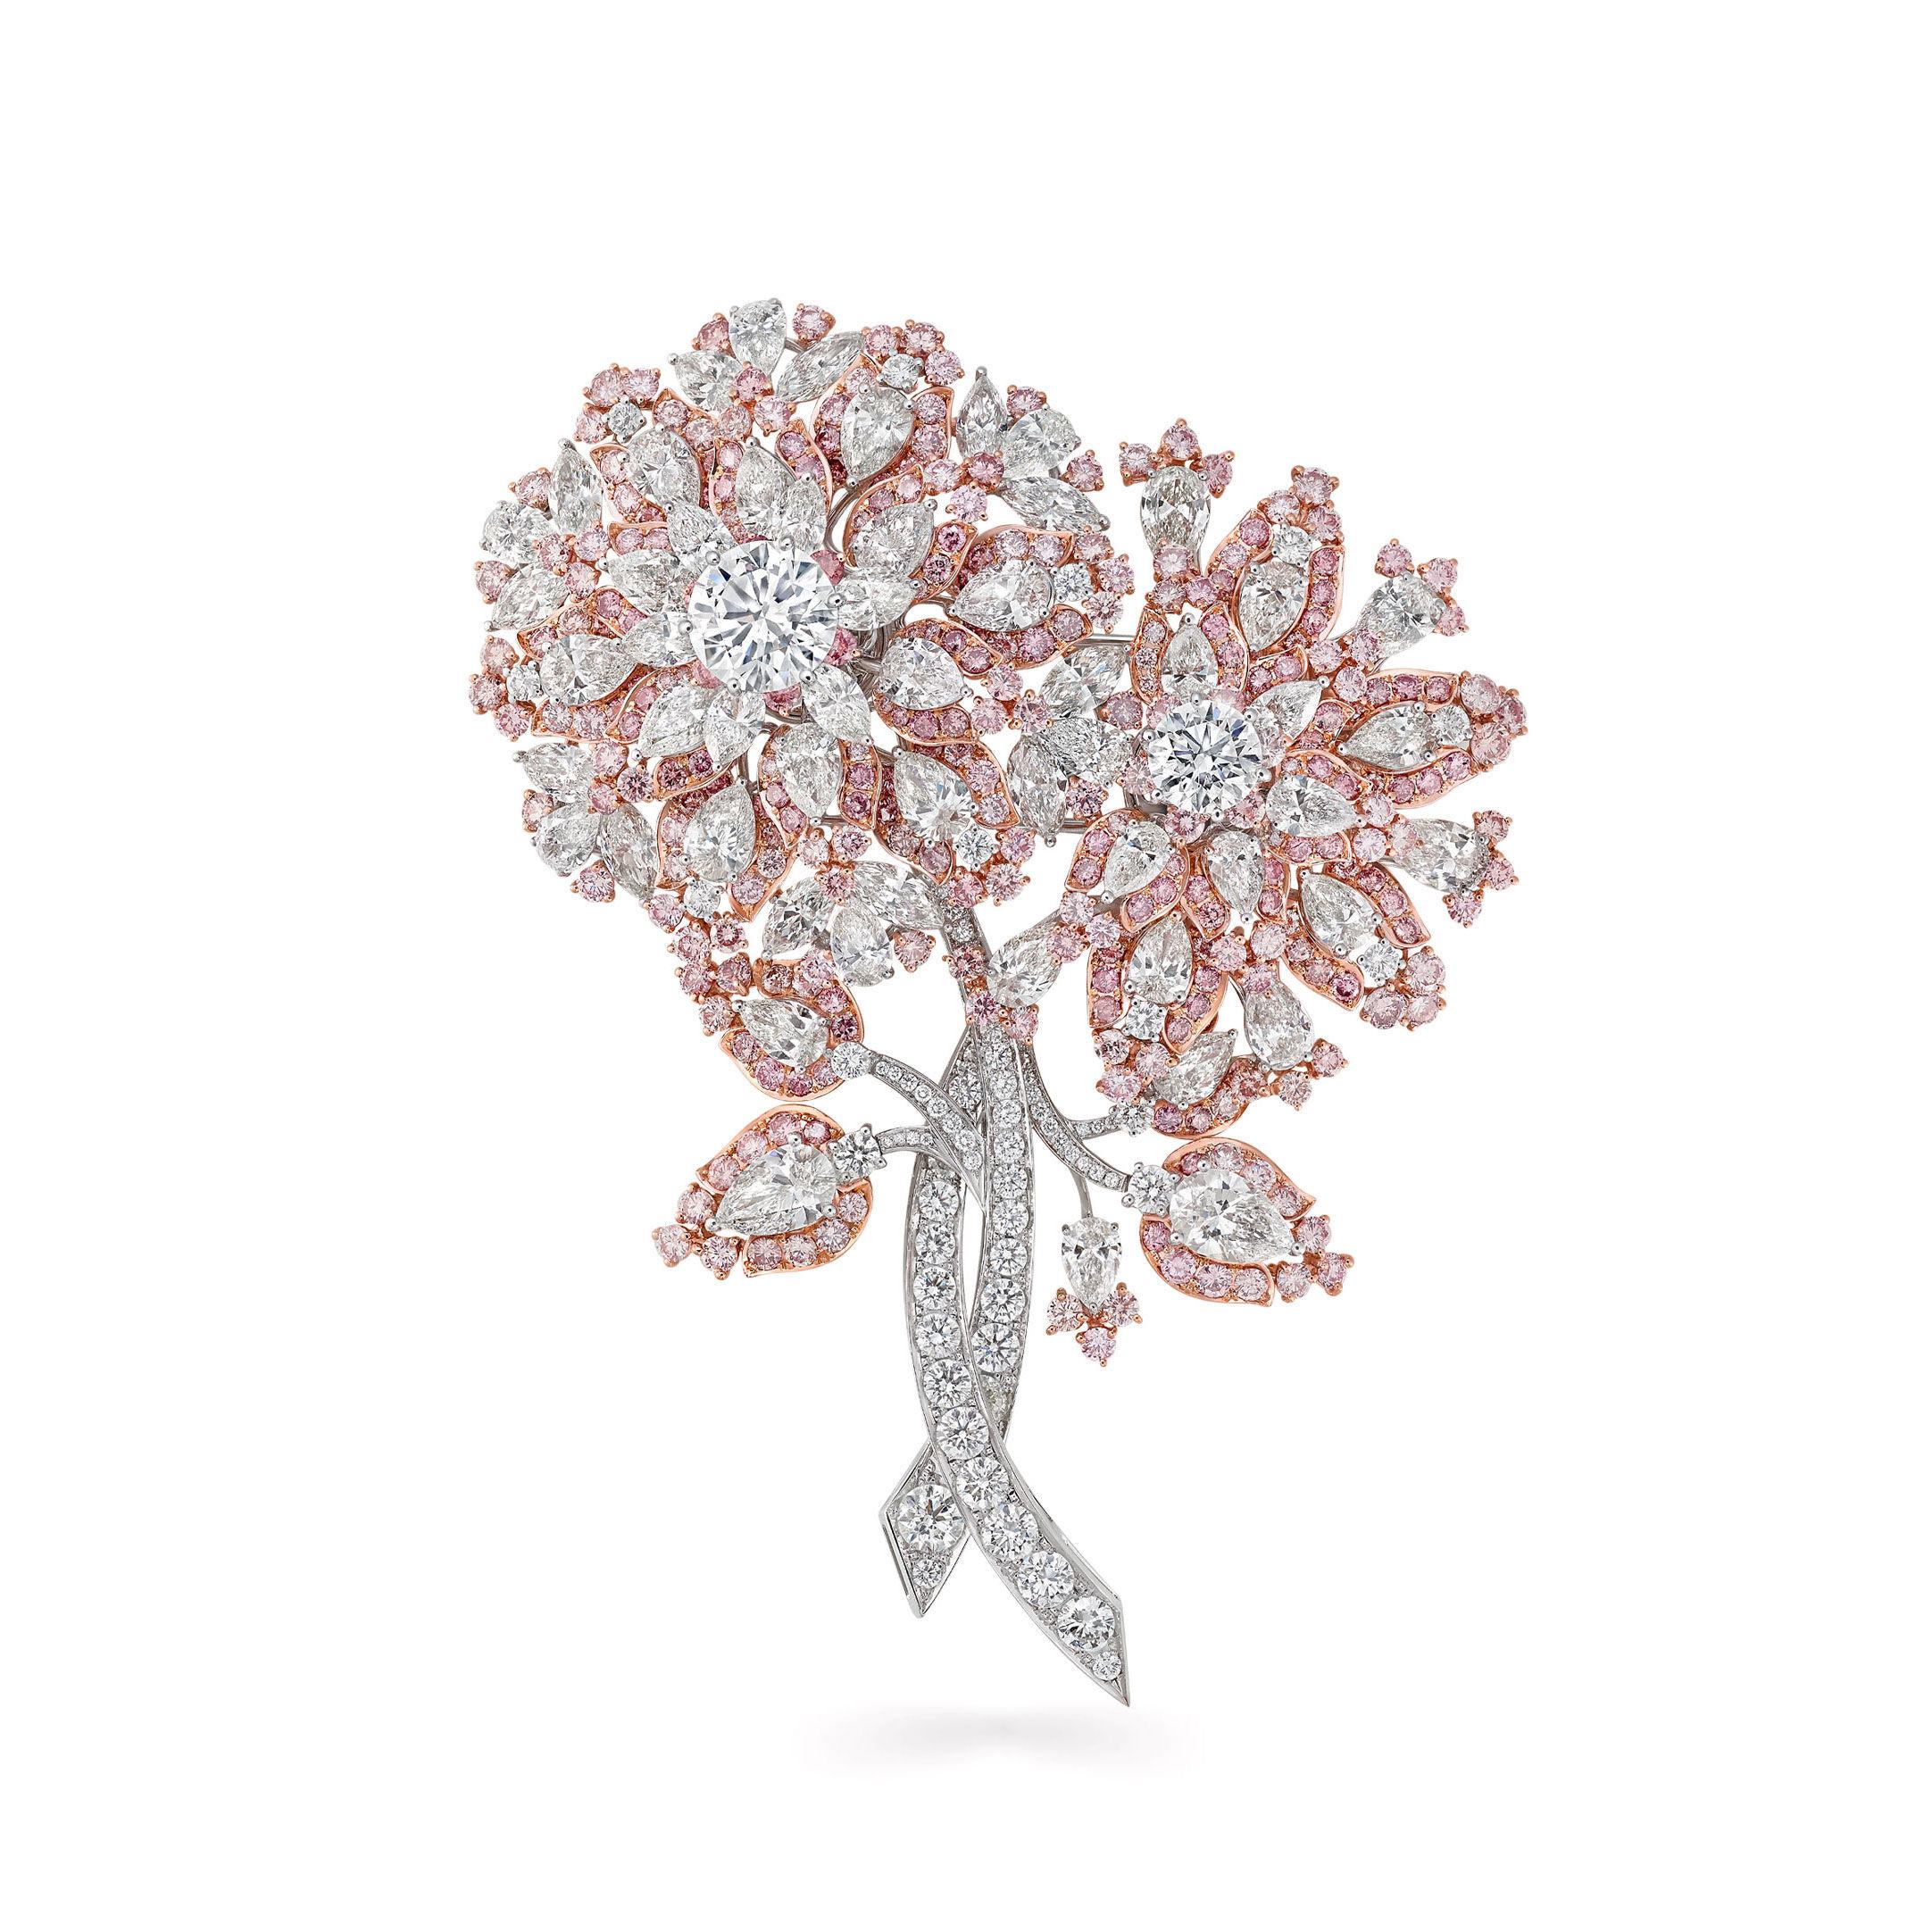 a Graff pink and white diamond high jewellery brooch